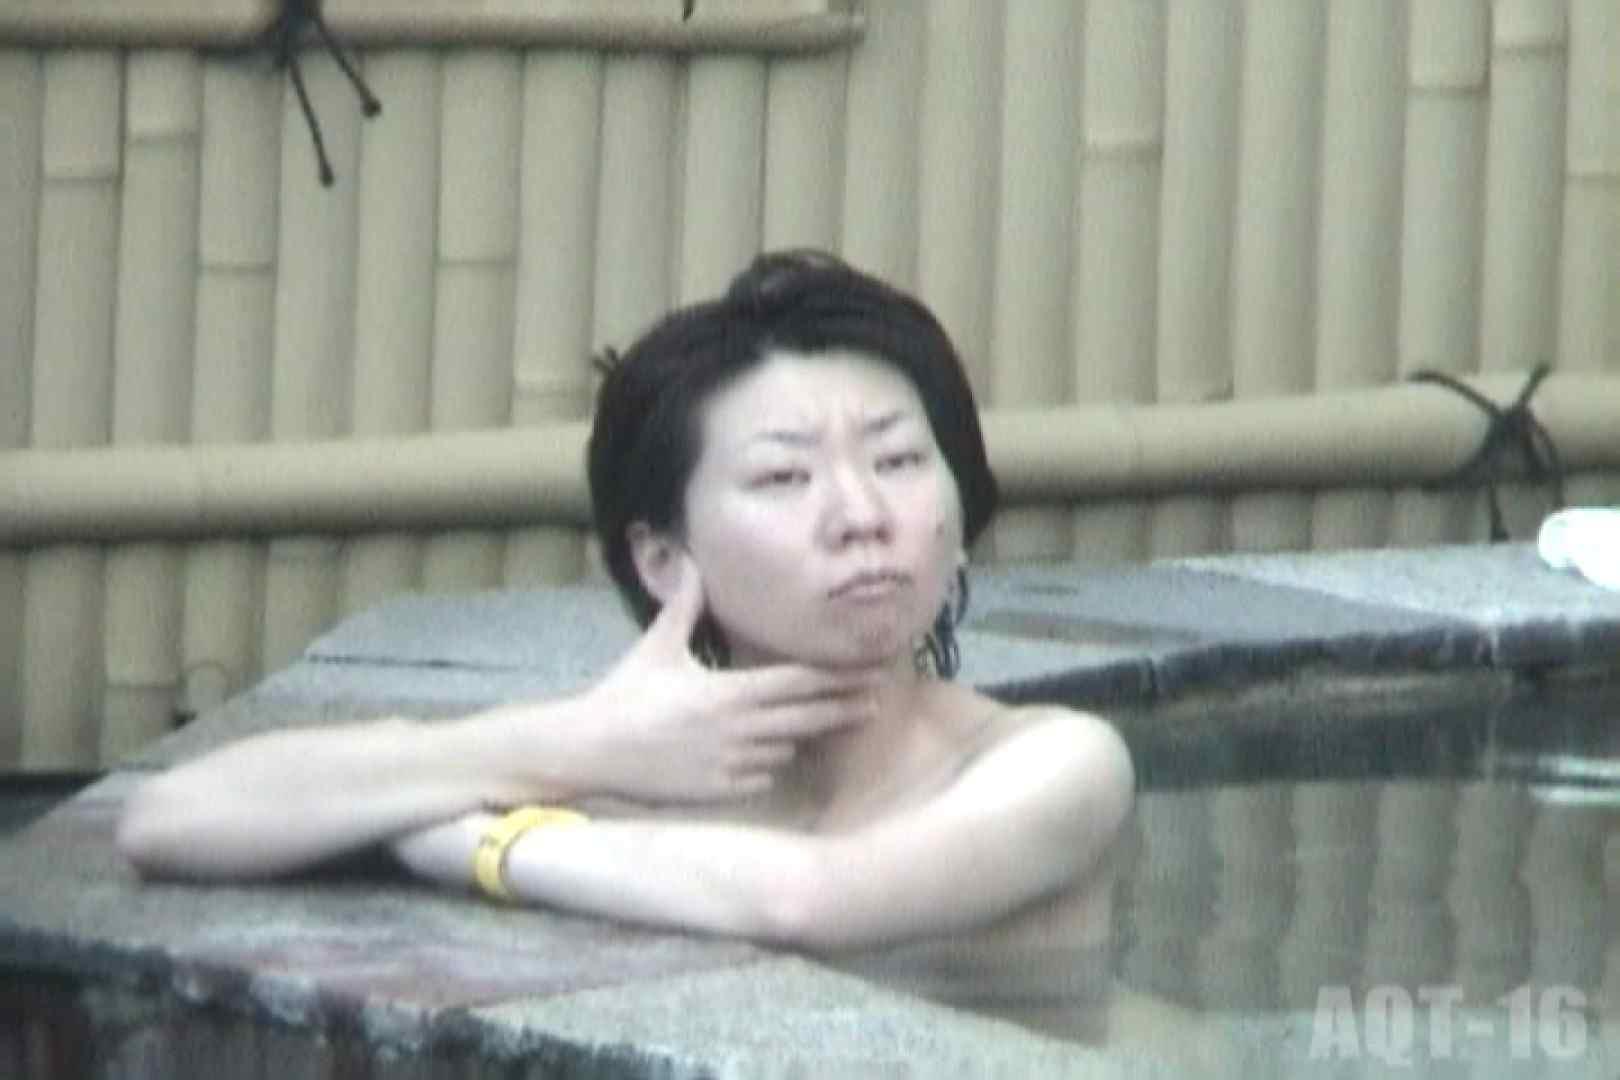 Aquaな露天風呂Vol.842 0 | 0  32連発 31